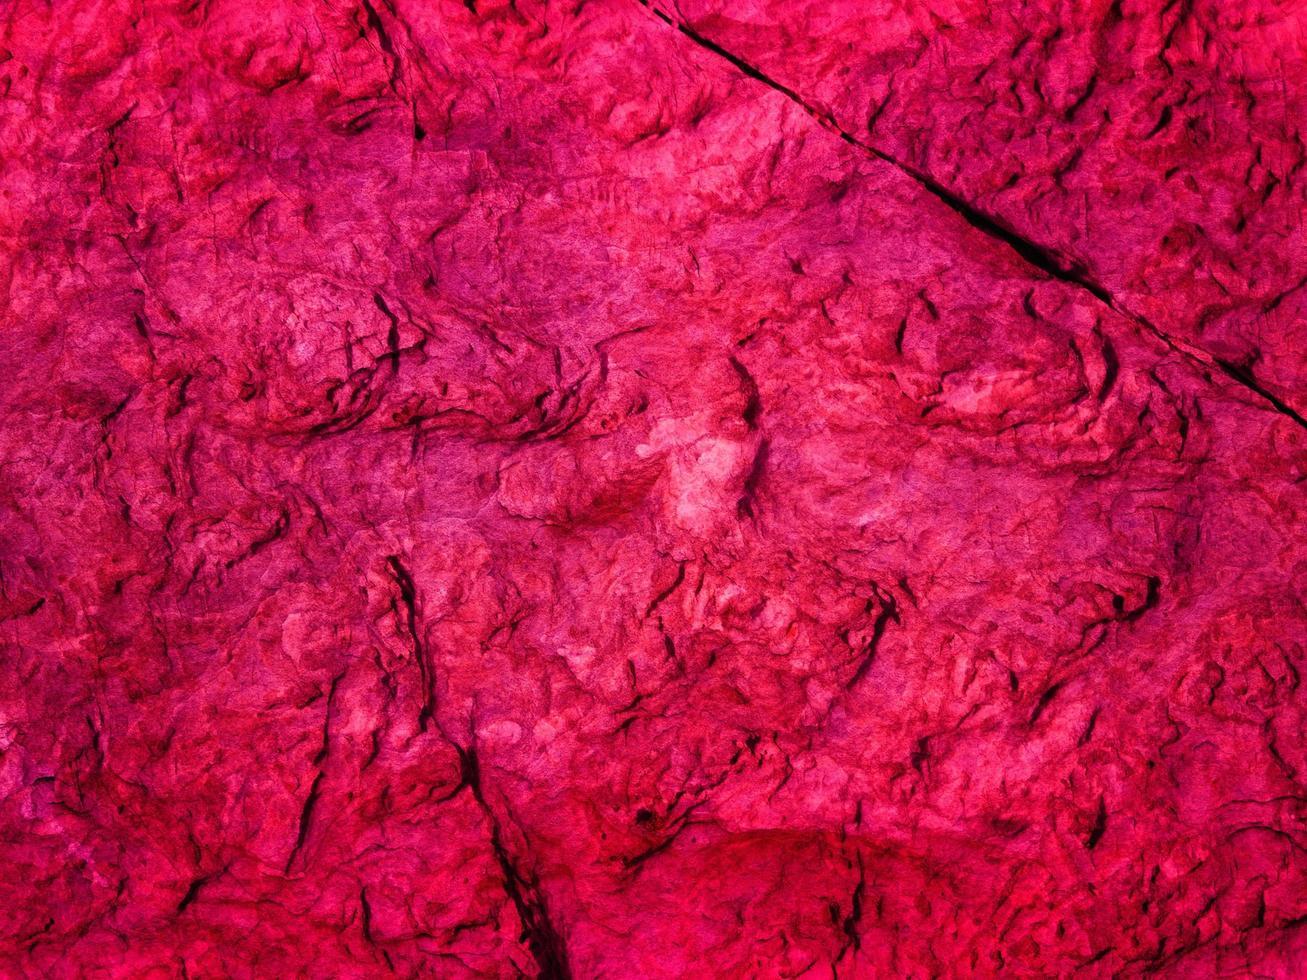 textura de piedra morada foto